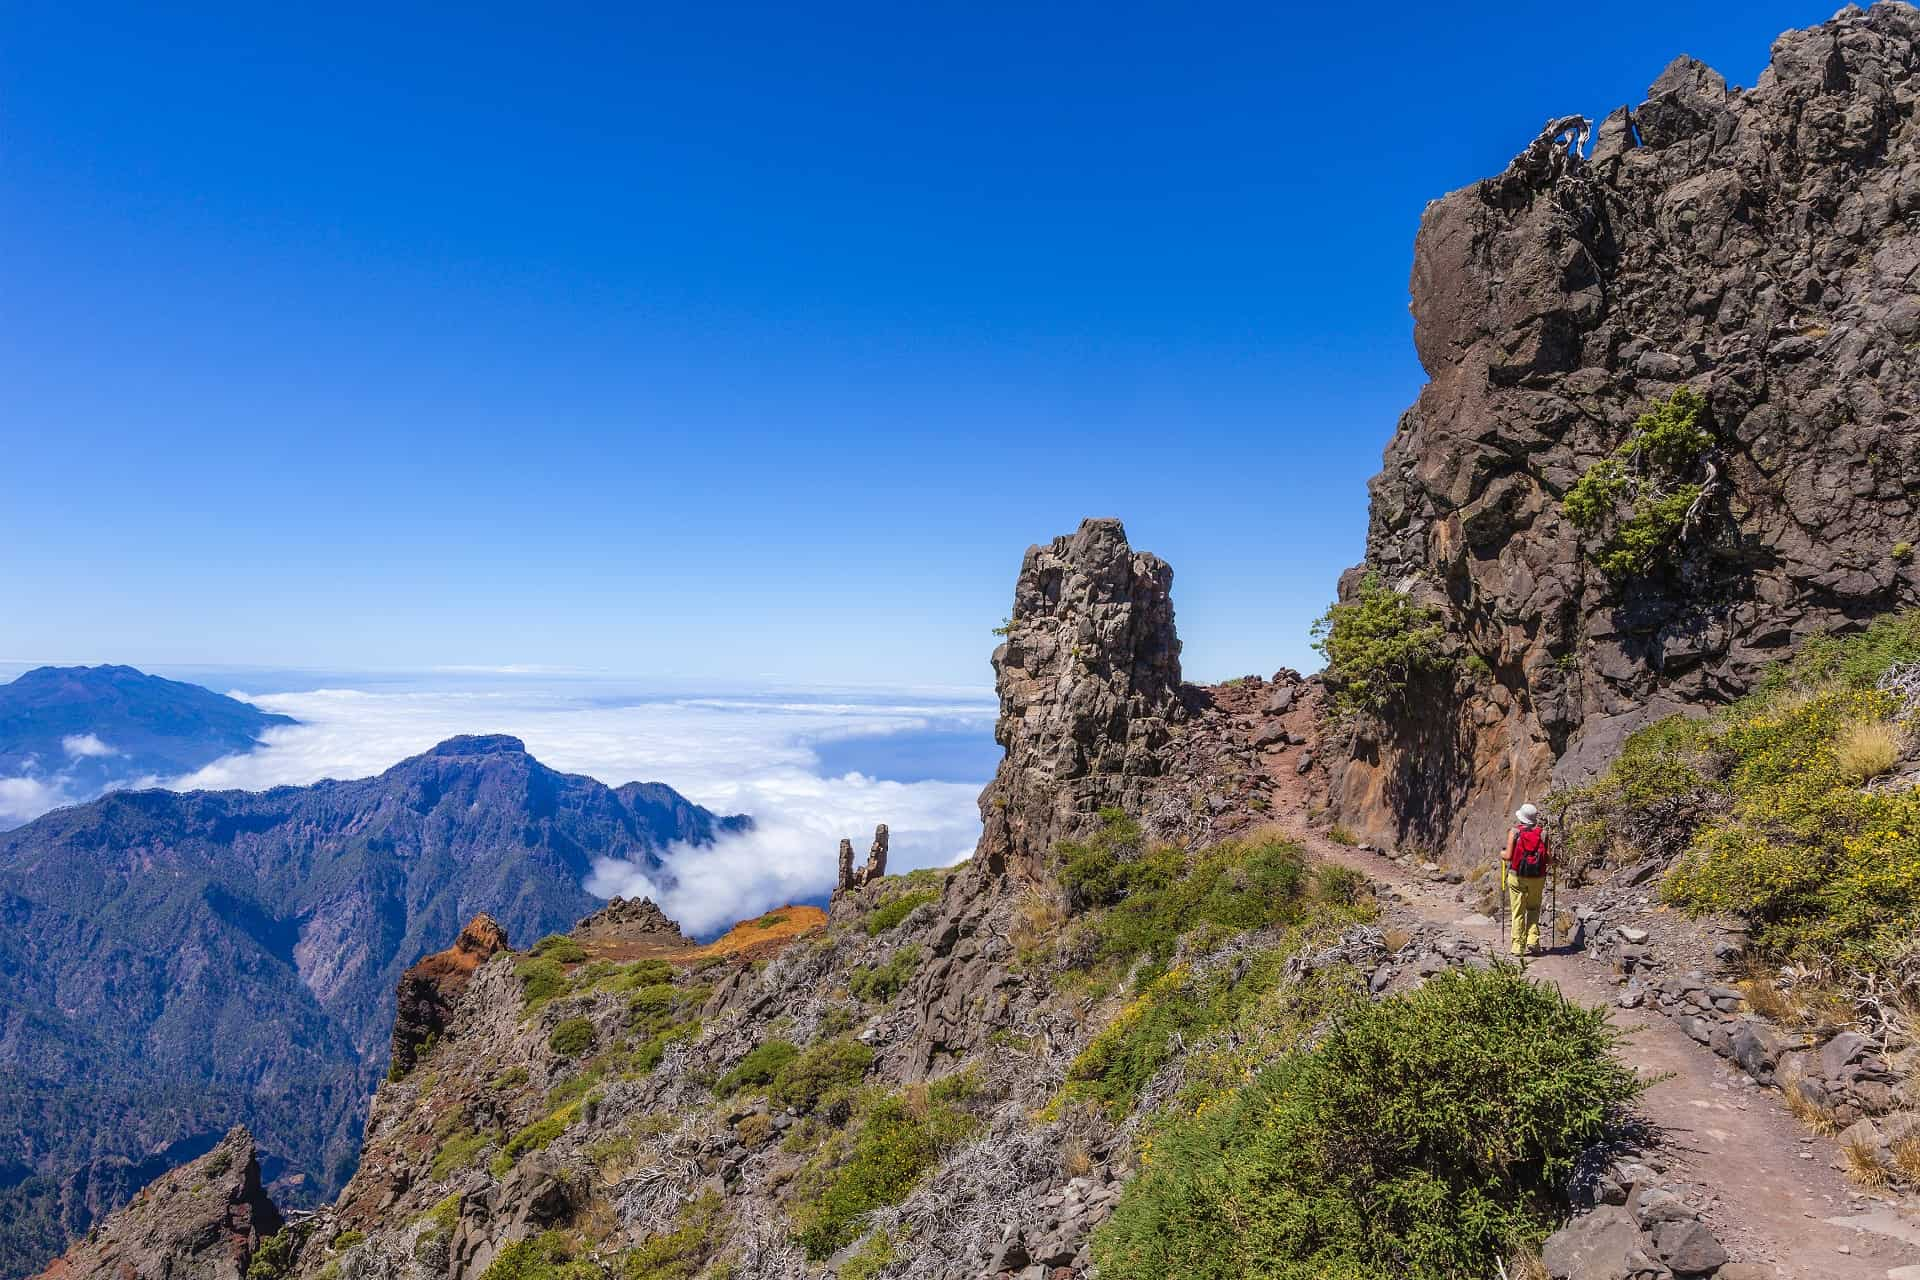 CanaryCompany - Ferienhäuser auf La Palma